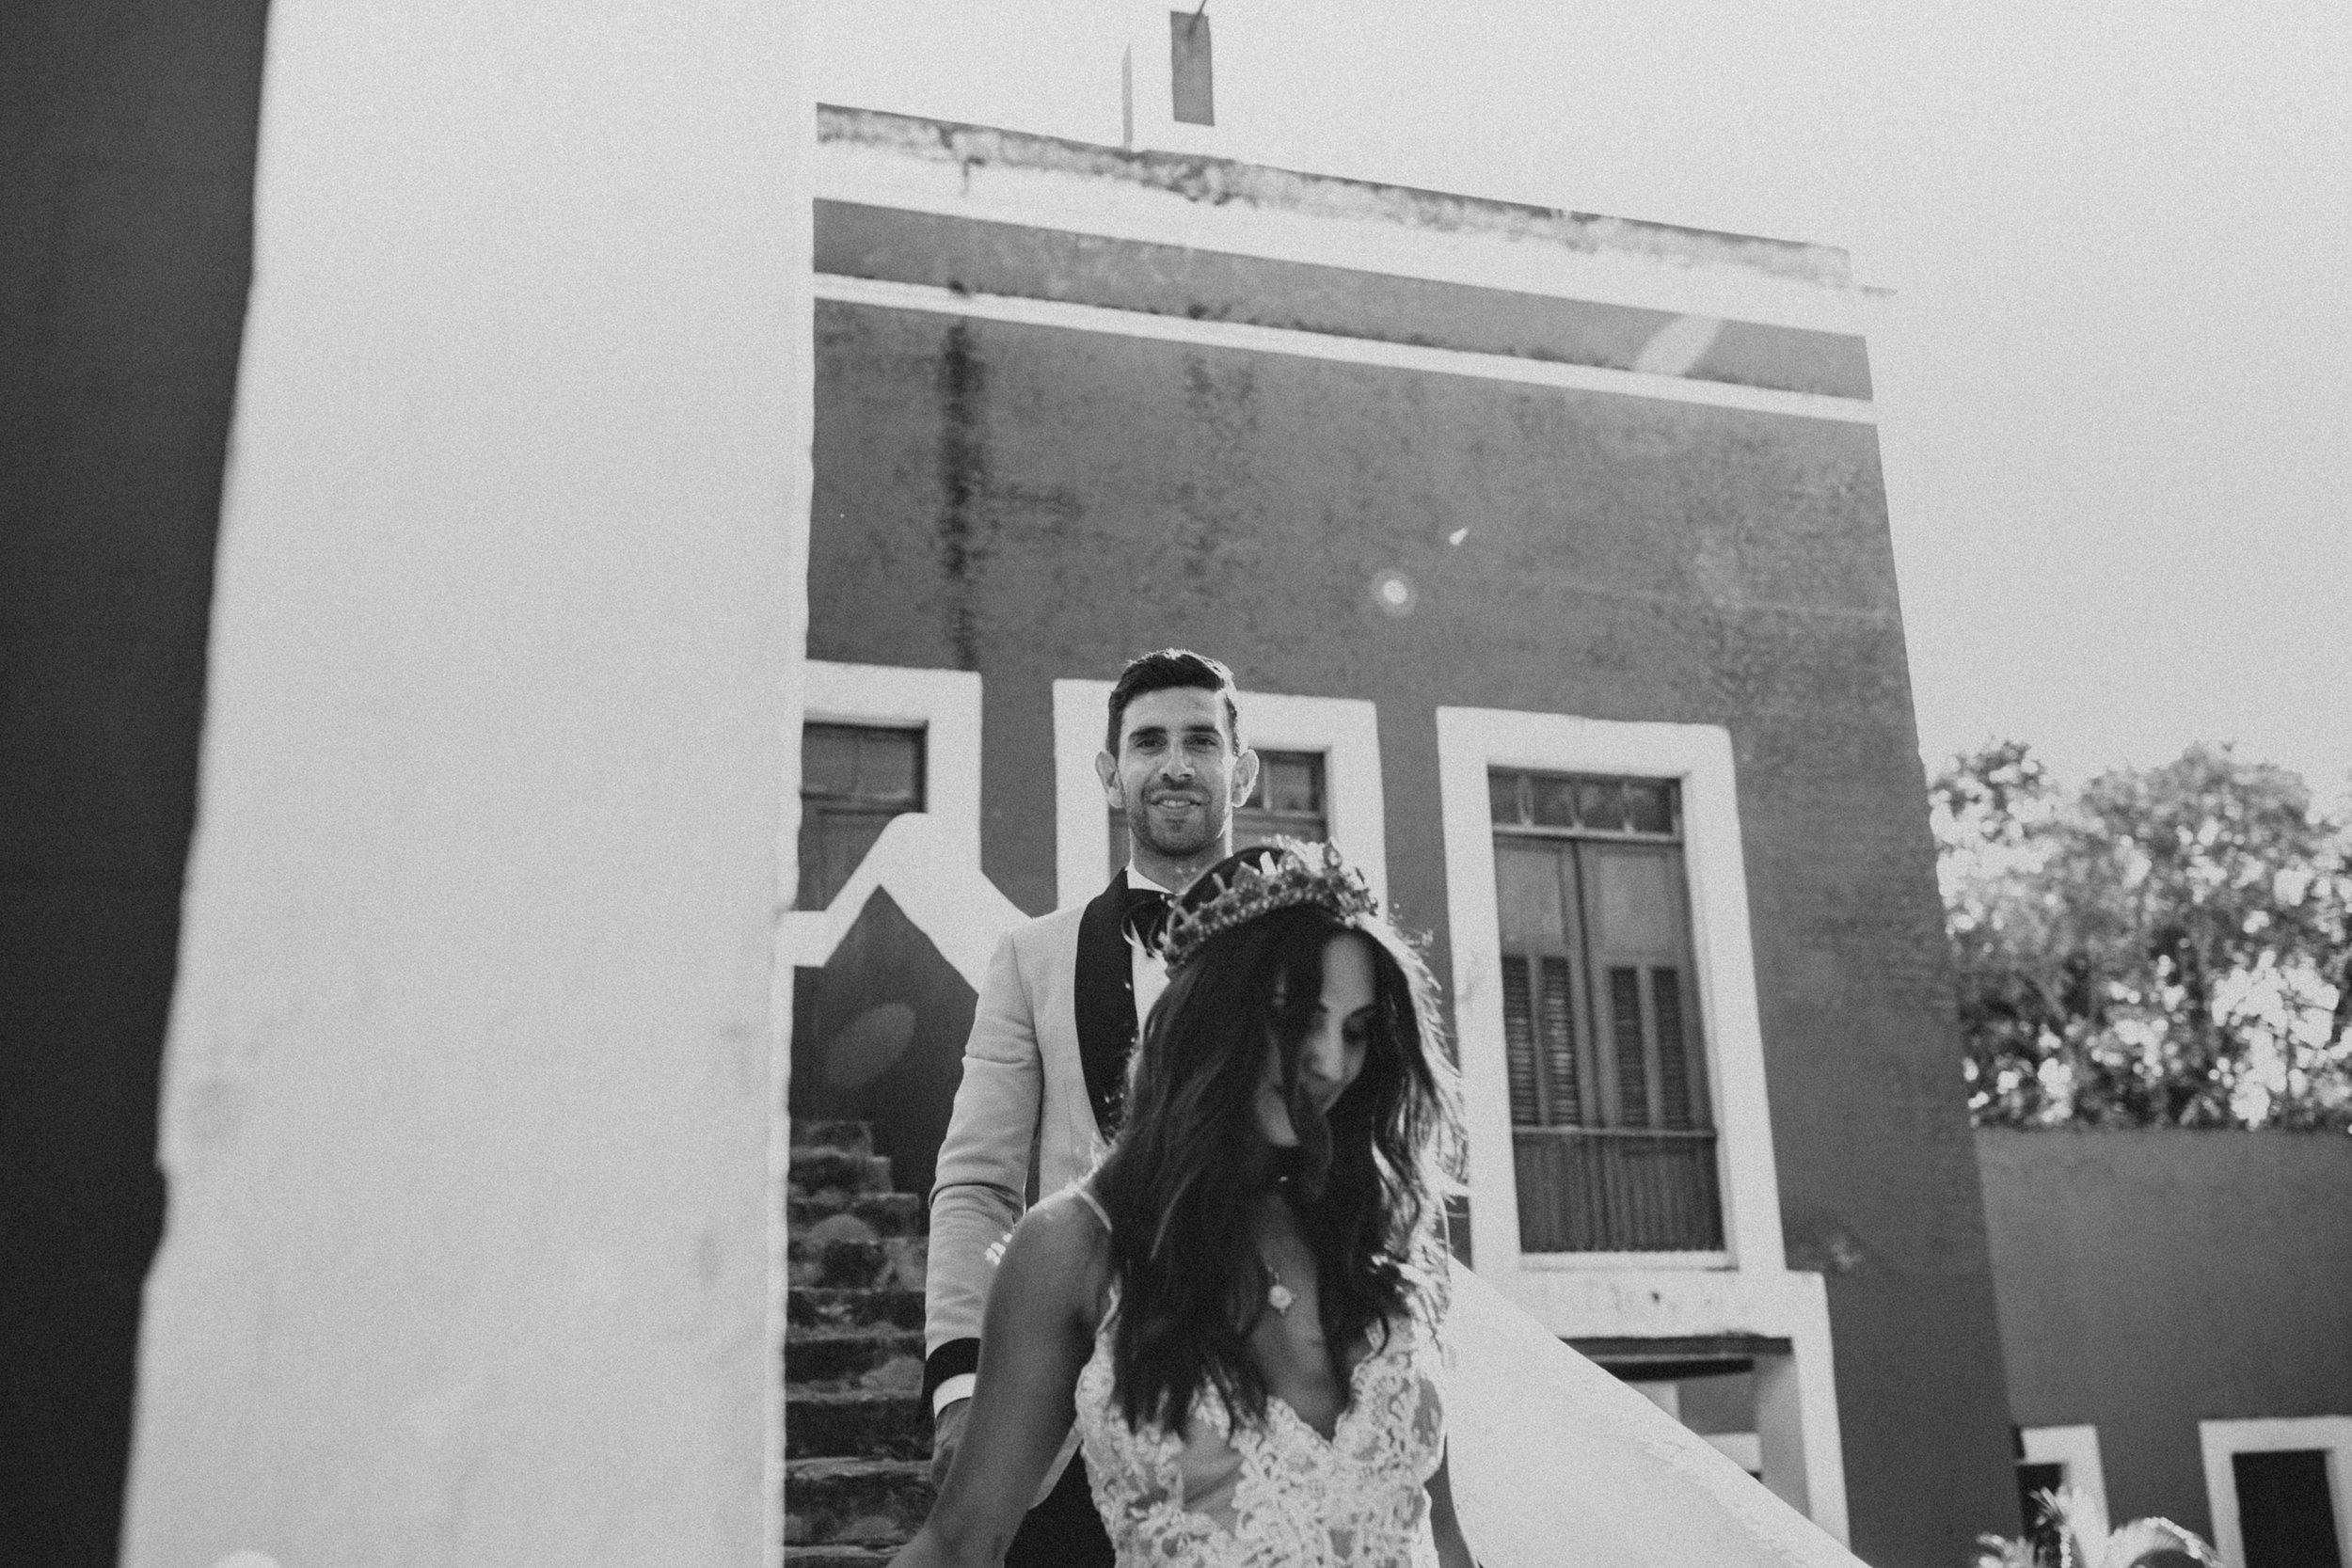 Hacienda Temozon Yucatan Mexico Wedding | Ida & Peter Emily Magers Photography-662.jpg